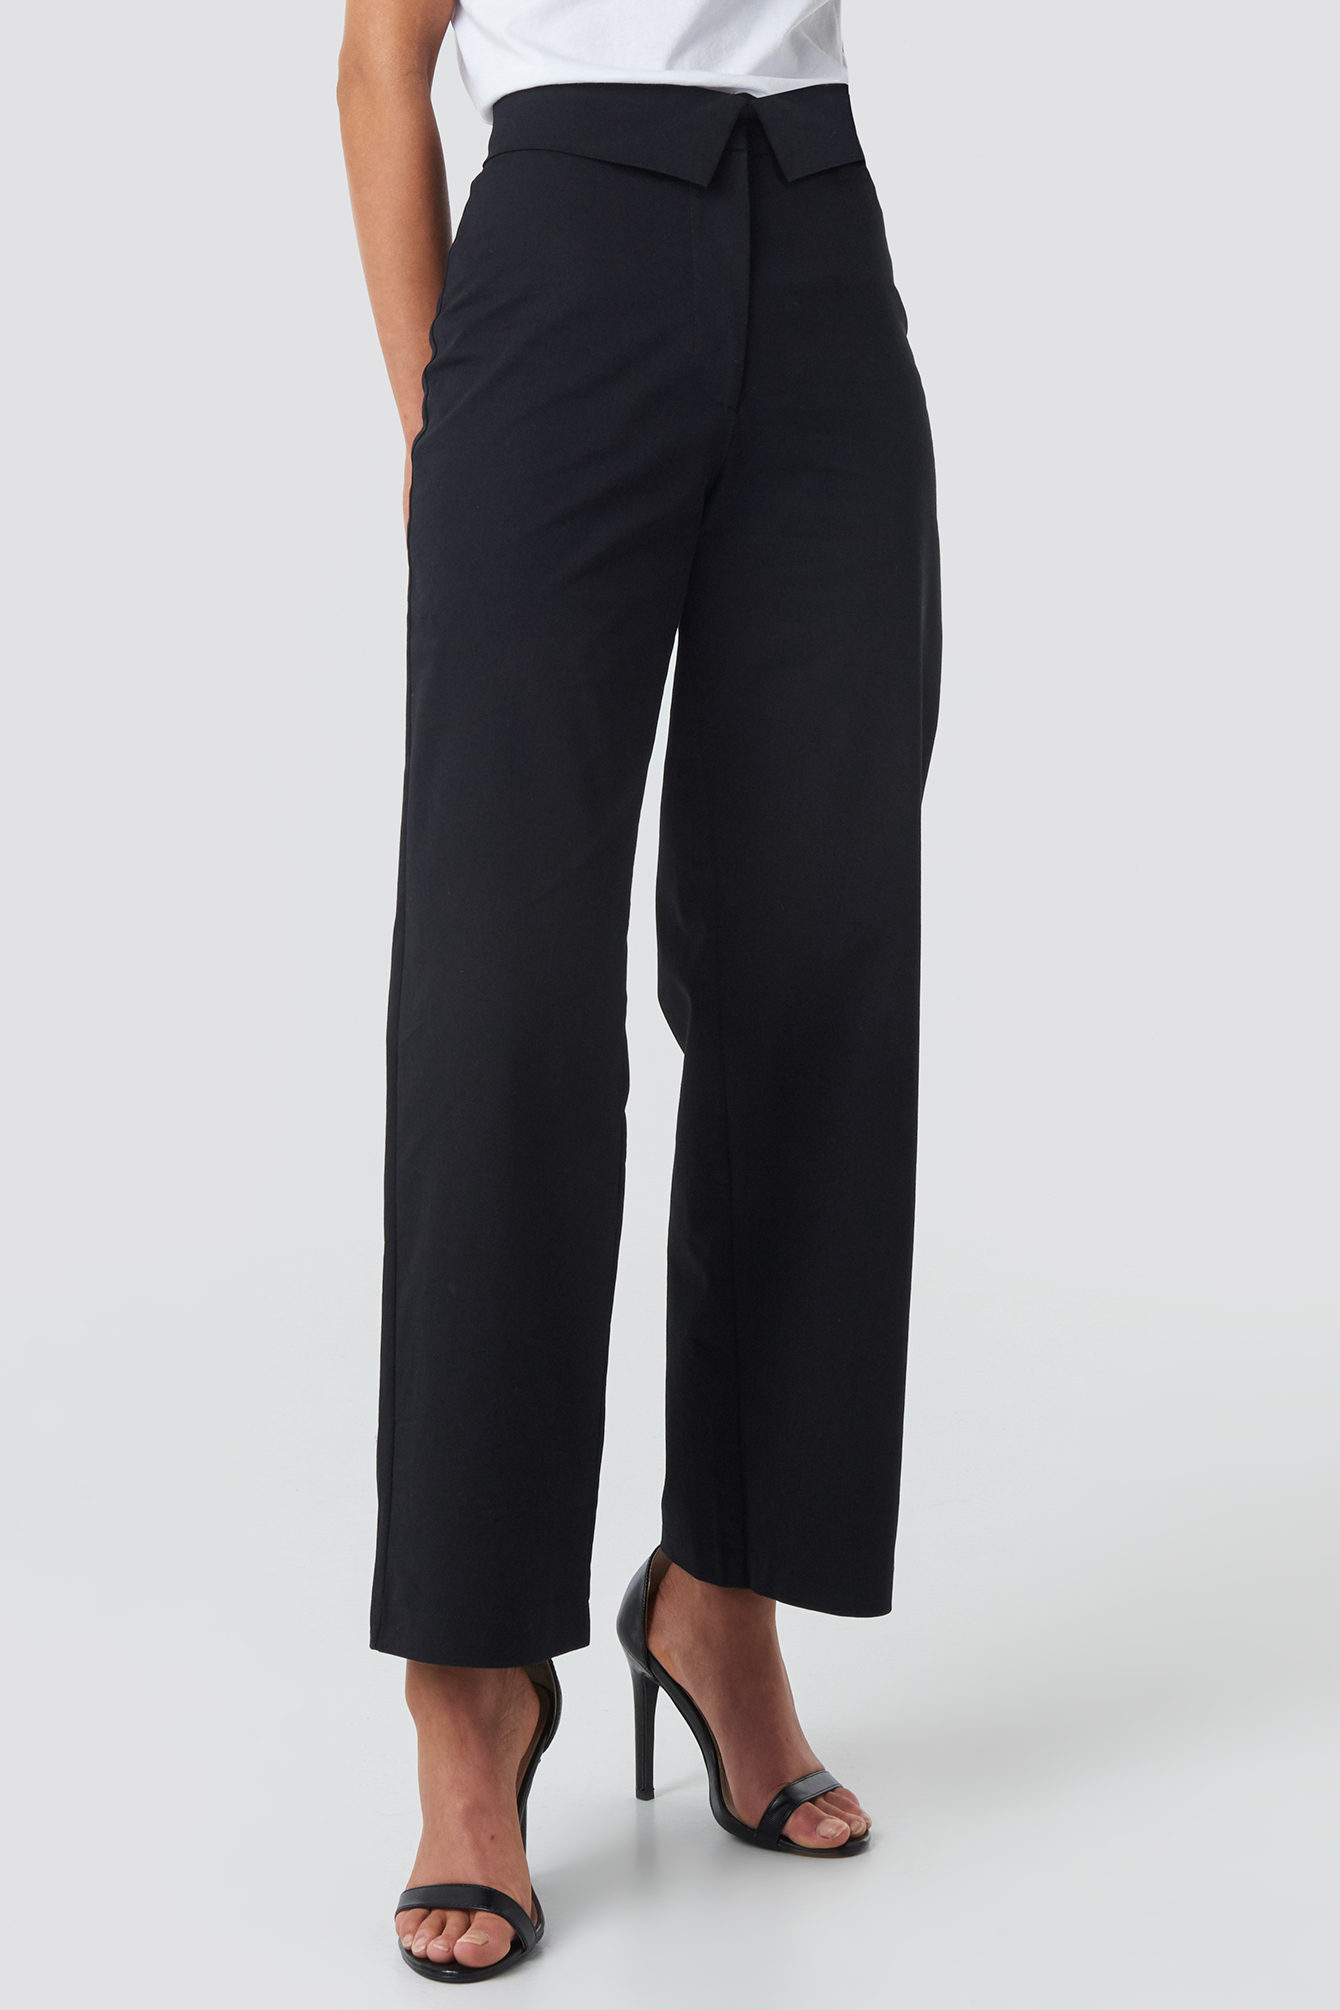 Turn Down Cotton Blend Pants NA-KD.COM